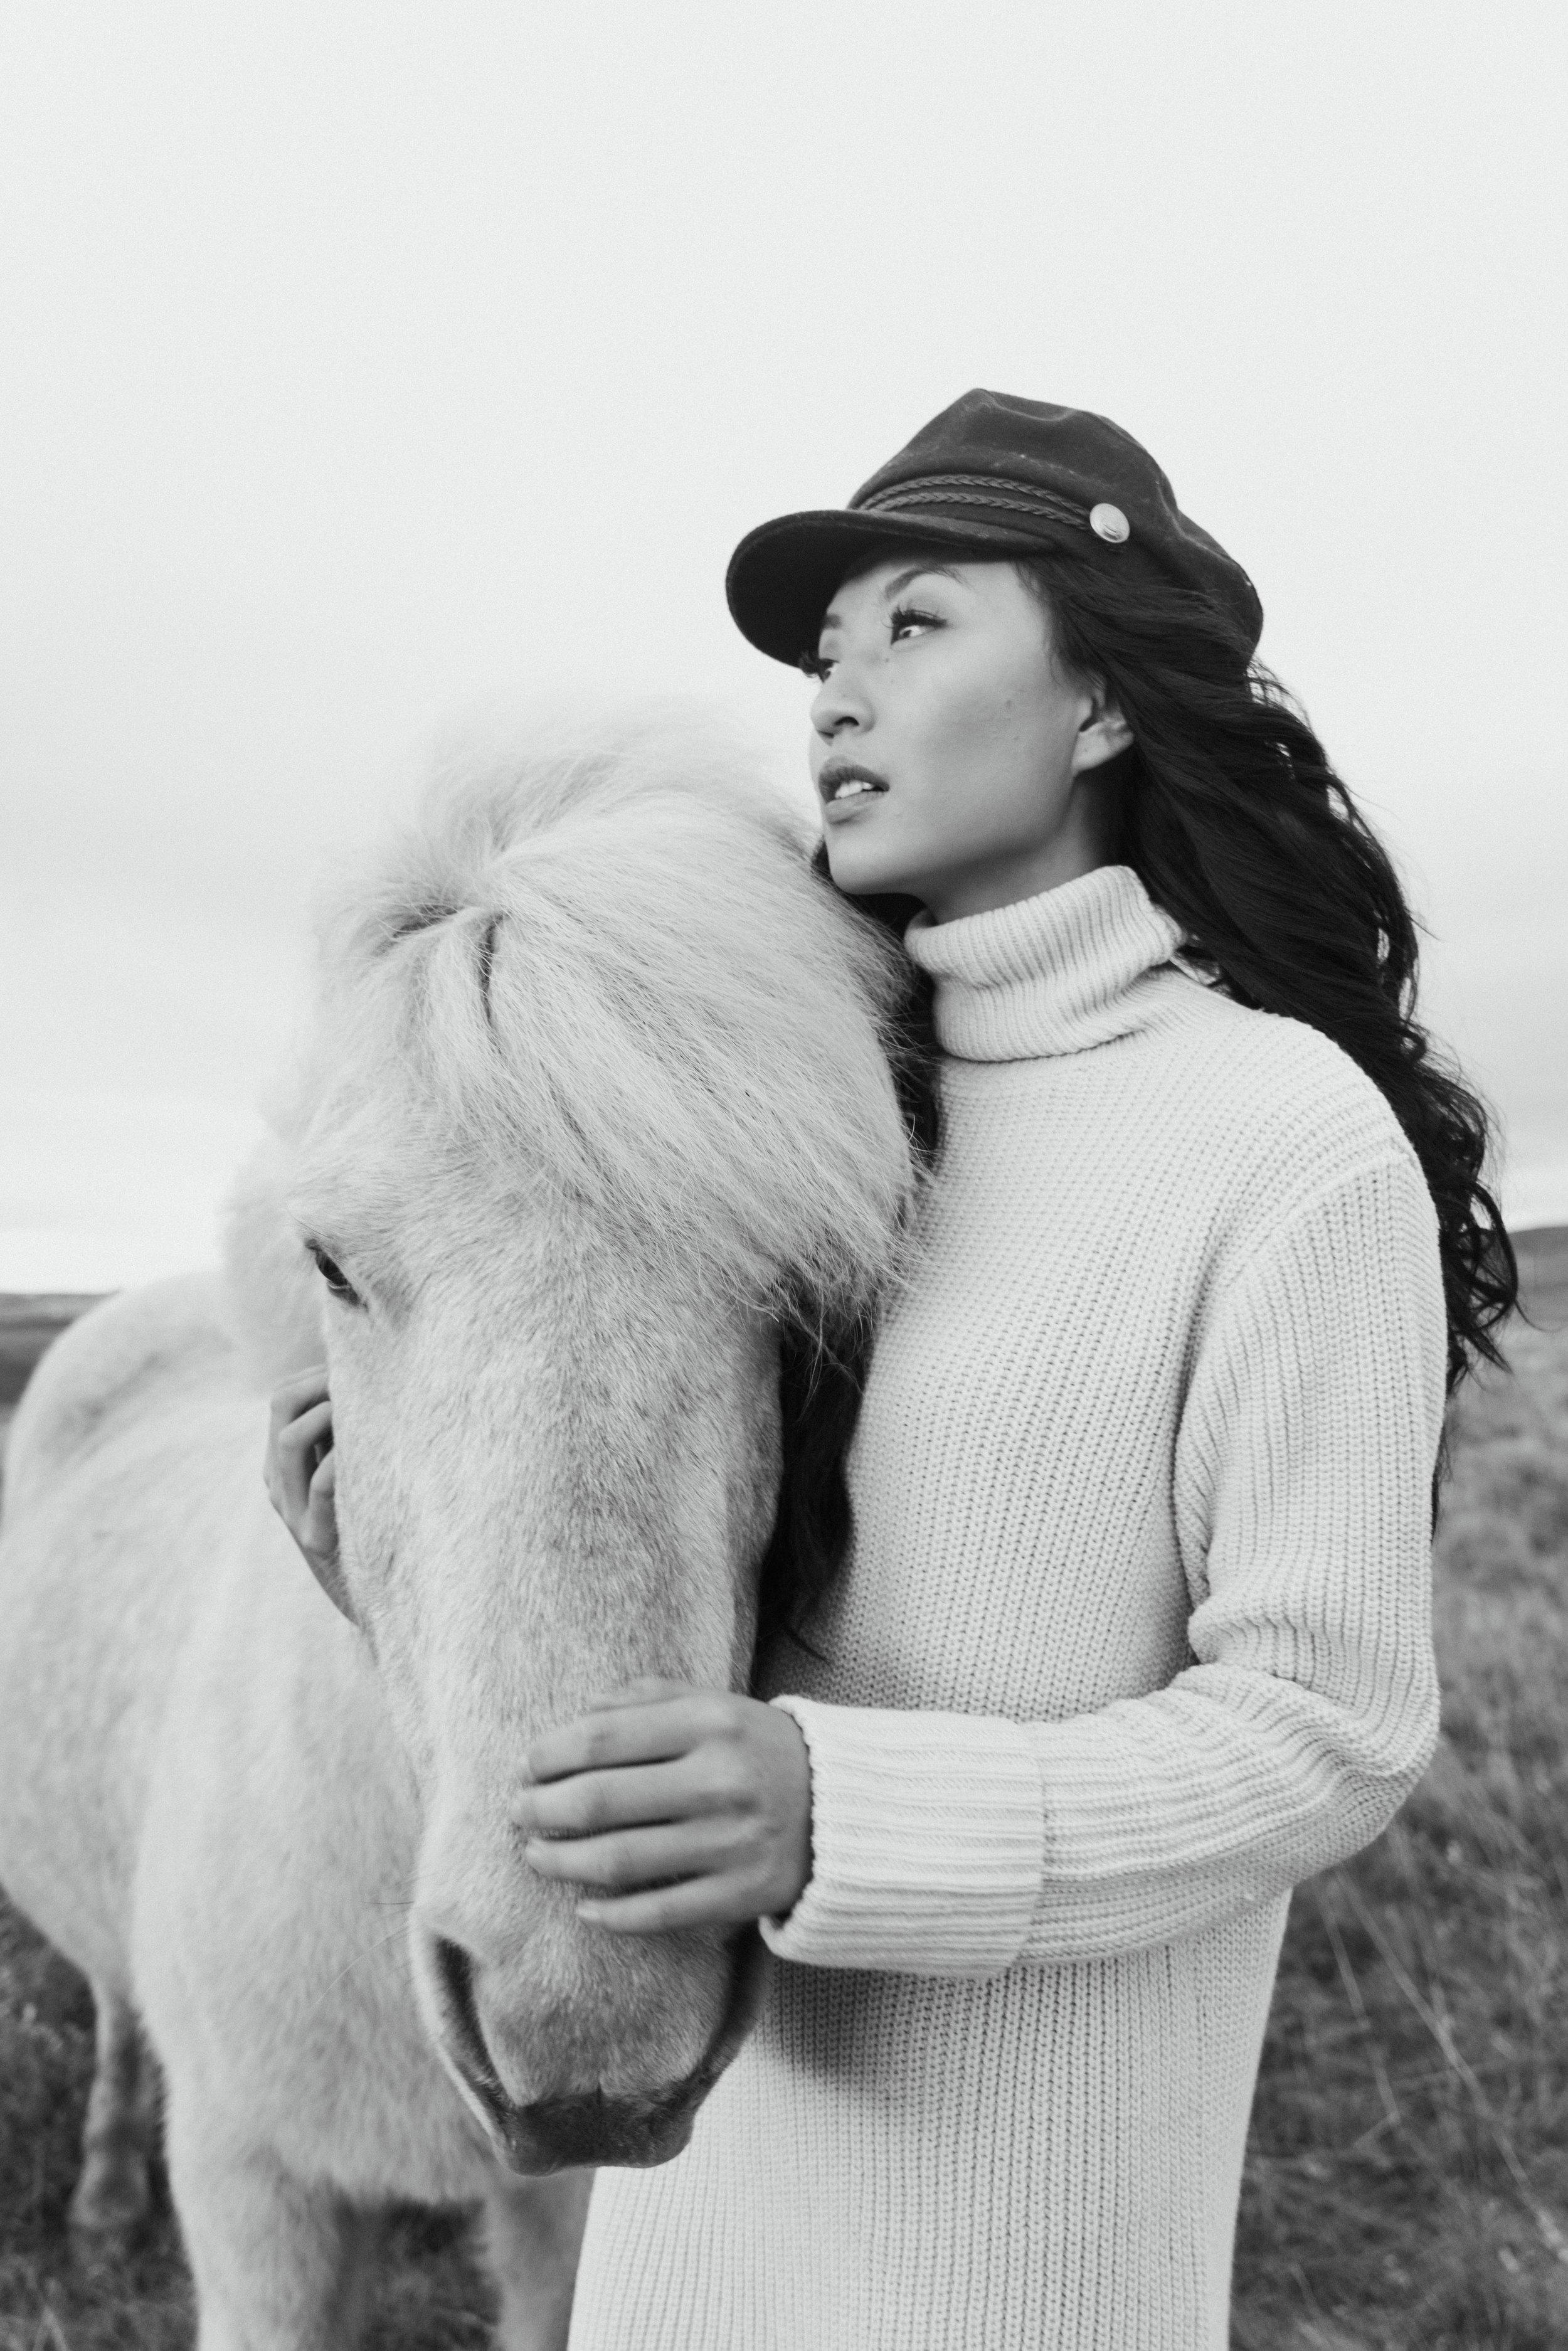 Icelandic Horses  Photographer: Stacie Yue  Model: Jiajing Yi  Hair & Makeup: Abigail Hill